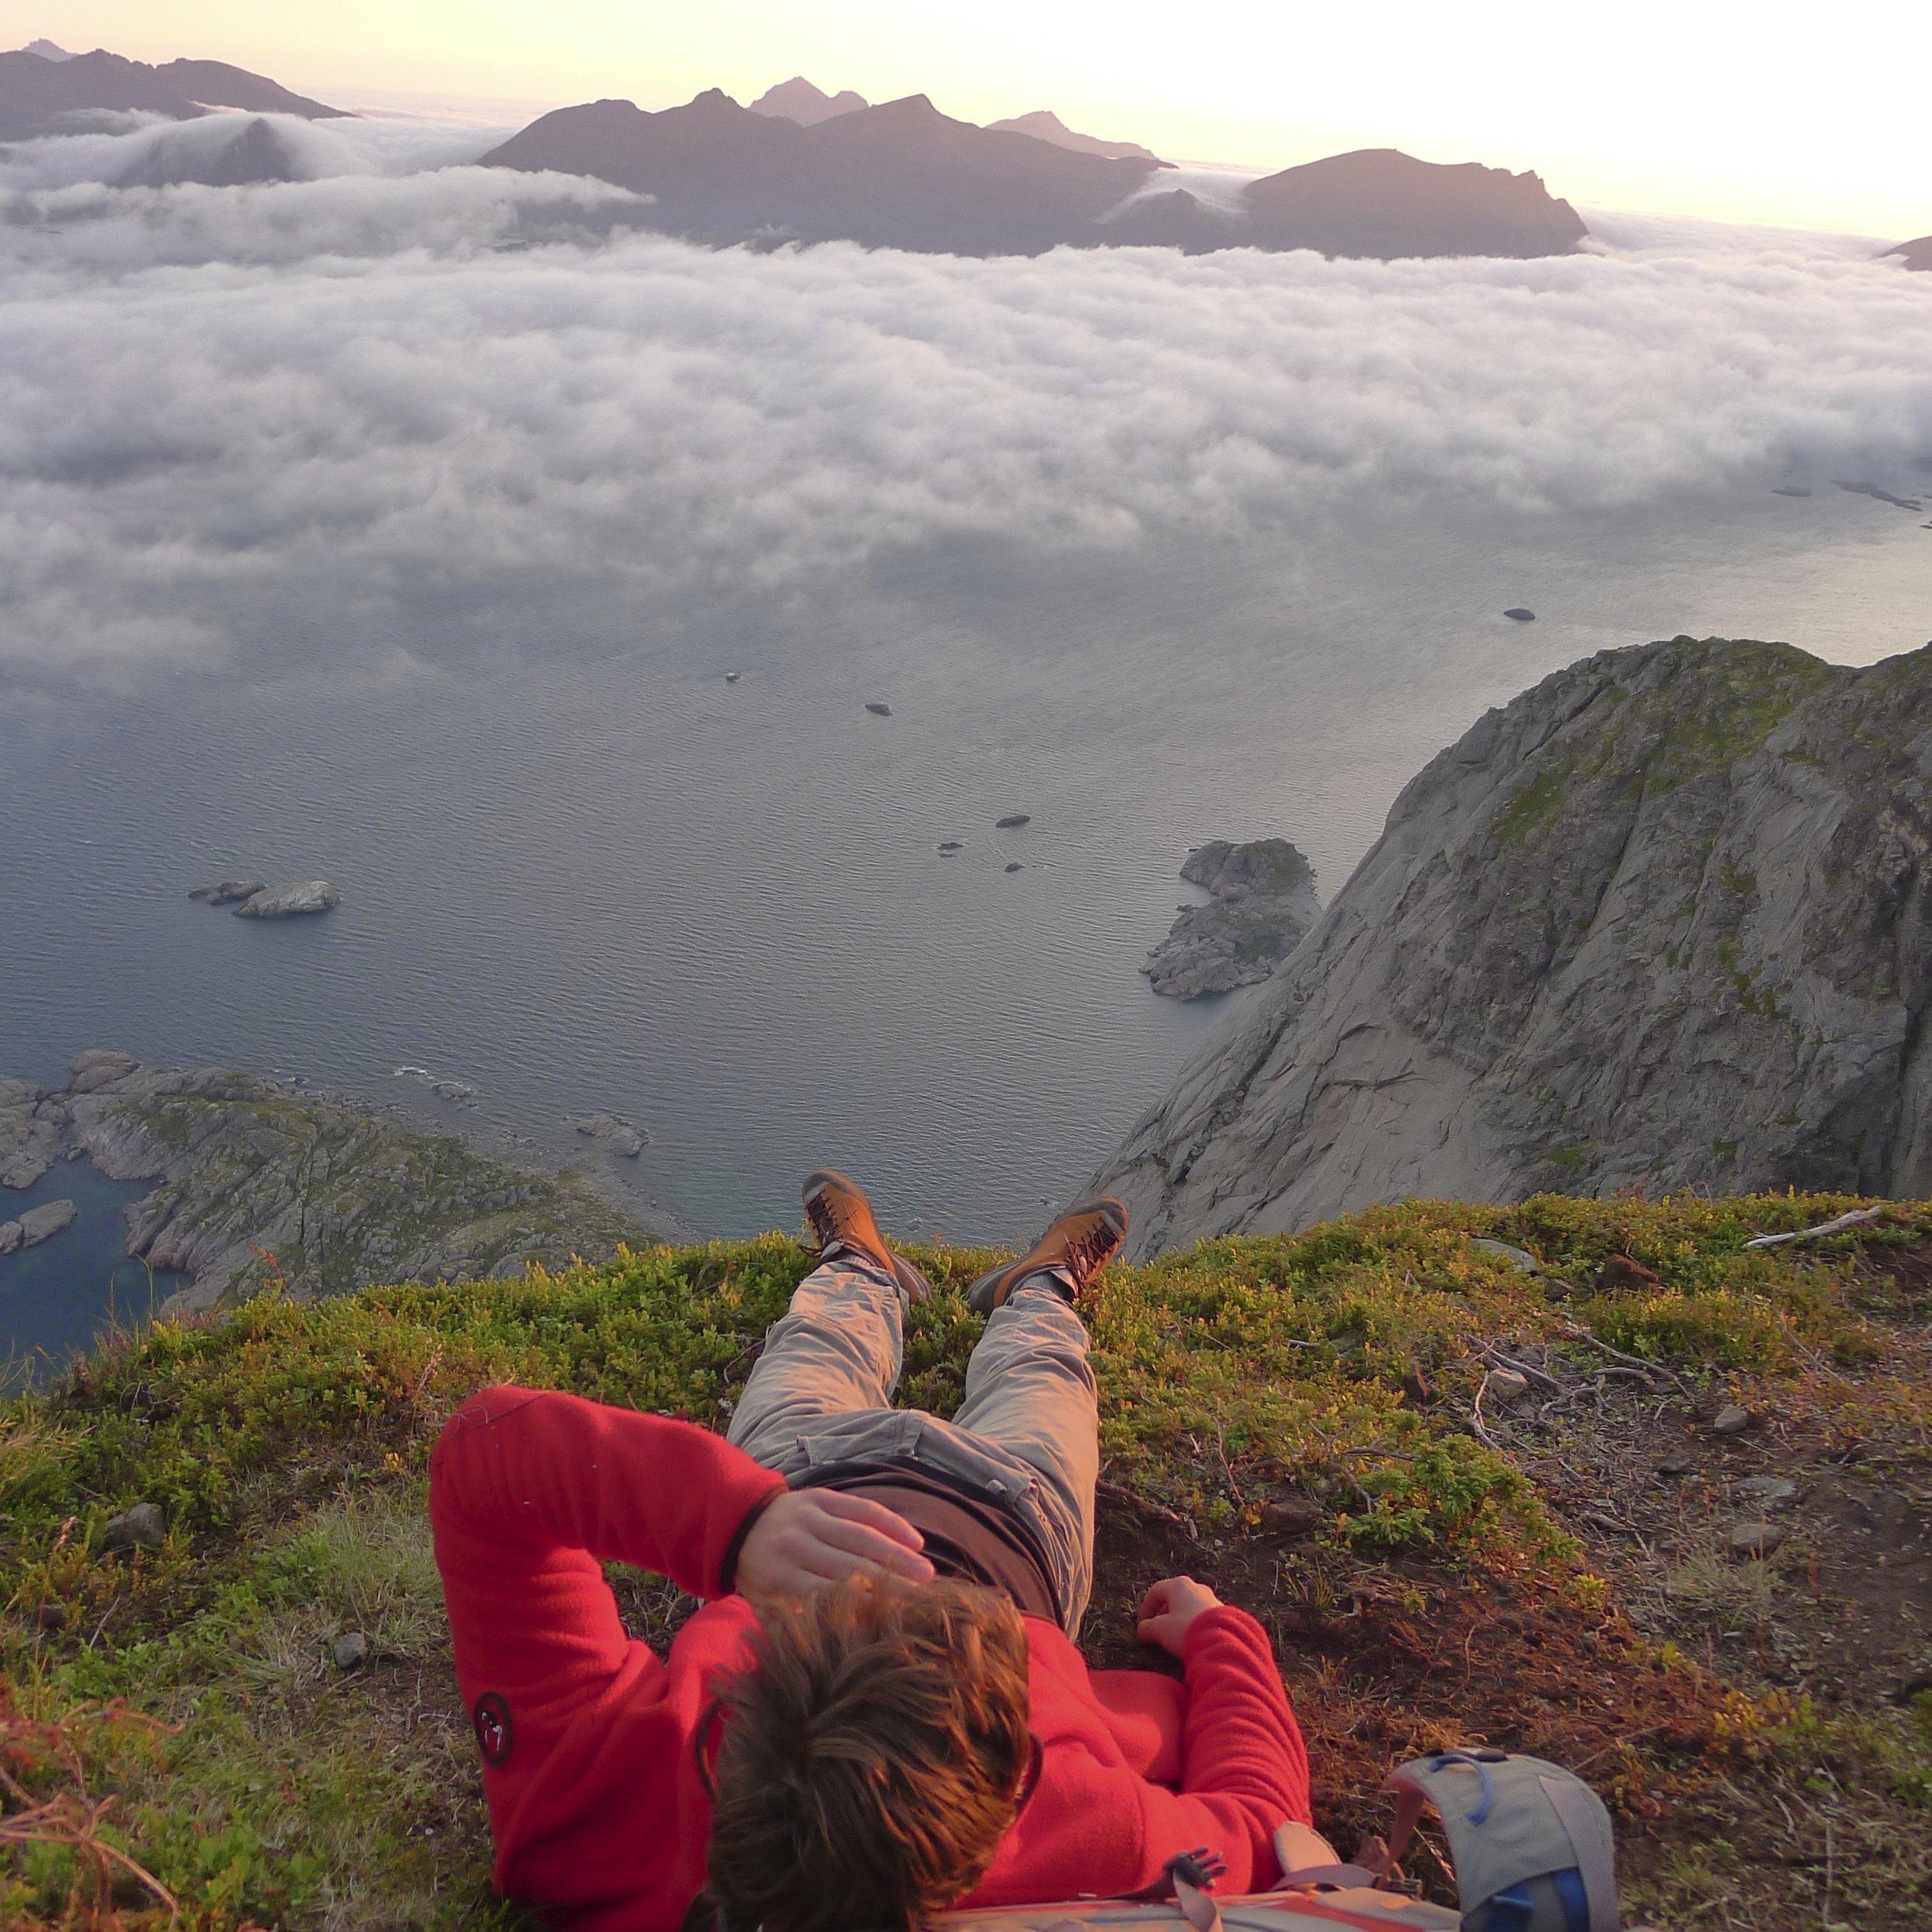 Hiking Trips - Join our hiking trips in Lofoten